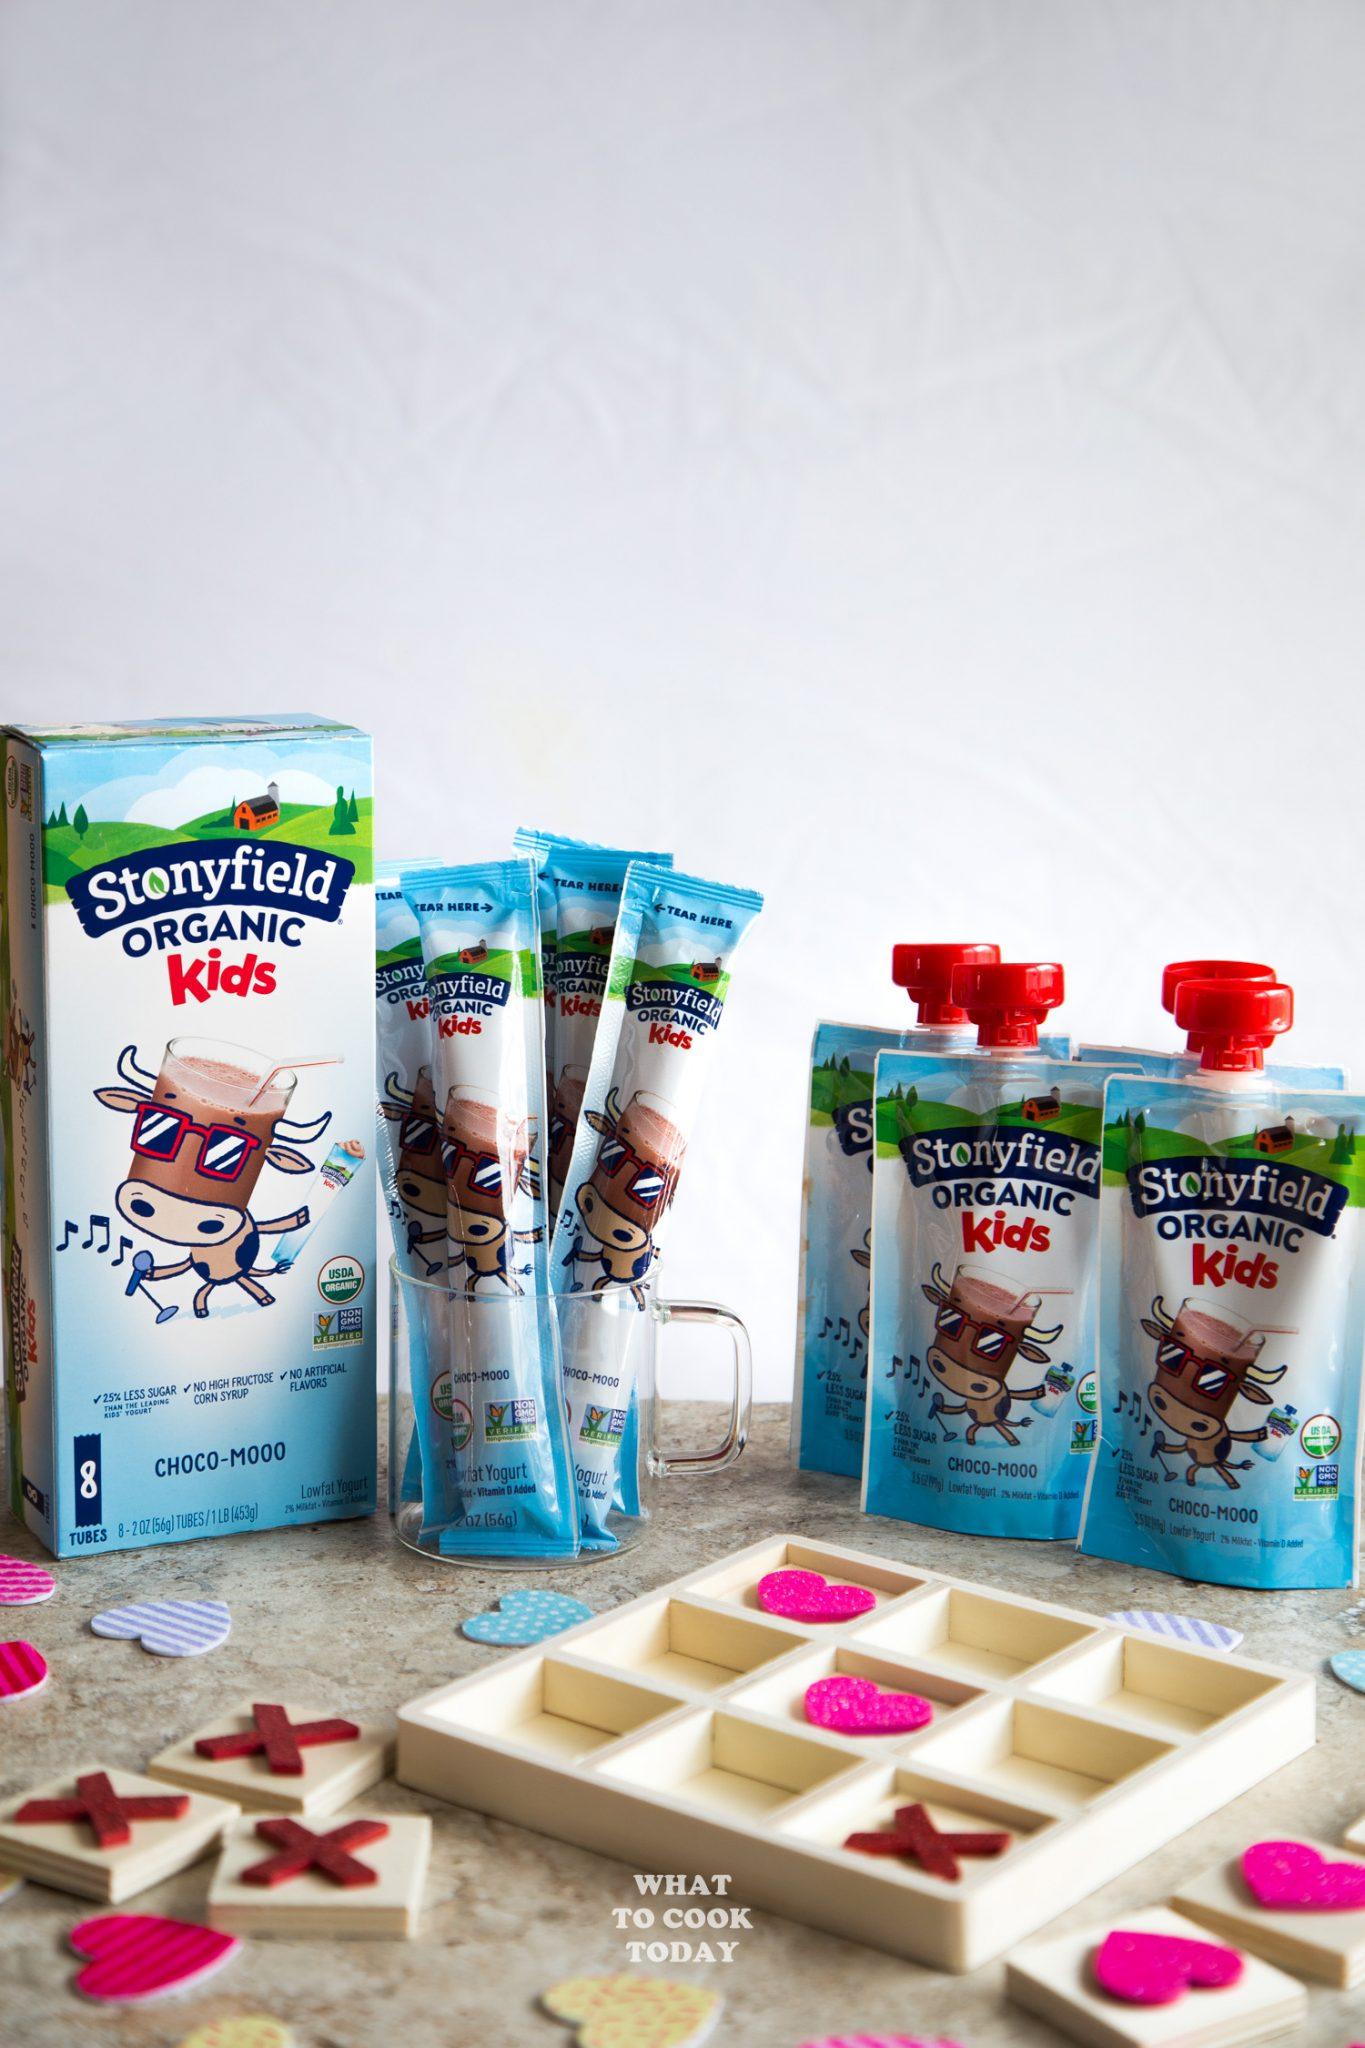 Stonyfield® Organic Kids® and Stonyfield® Organic Kids® Choco-Mooo AD #StonyfieldKids